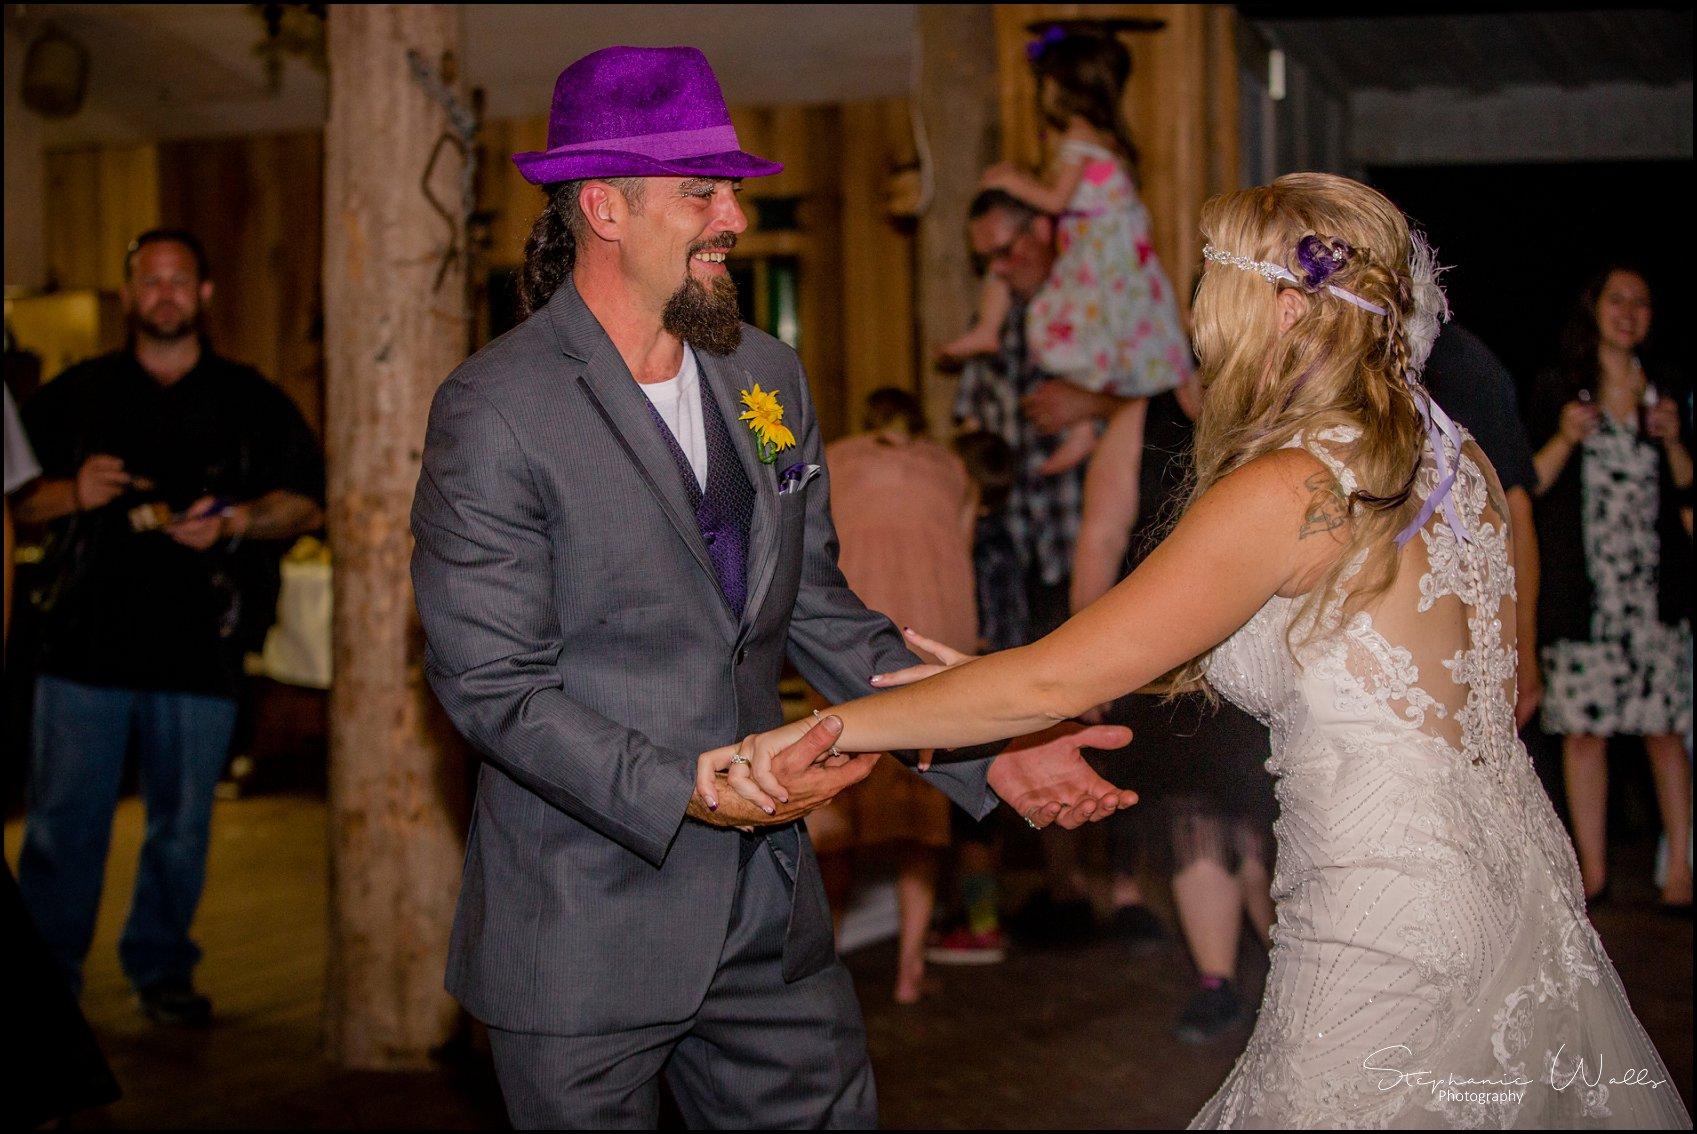 Everist Wedding 063 Patti & Bobbys | Troll Haven Castle & Bandy Farms | Sequim, Wa Wedding Photographer